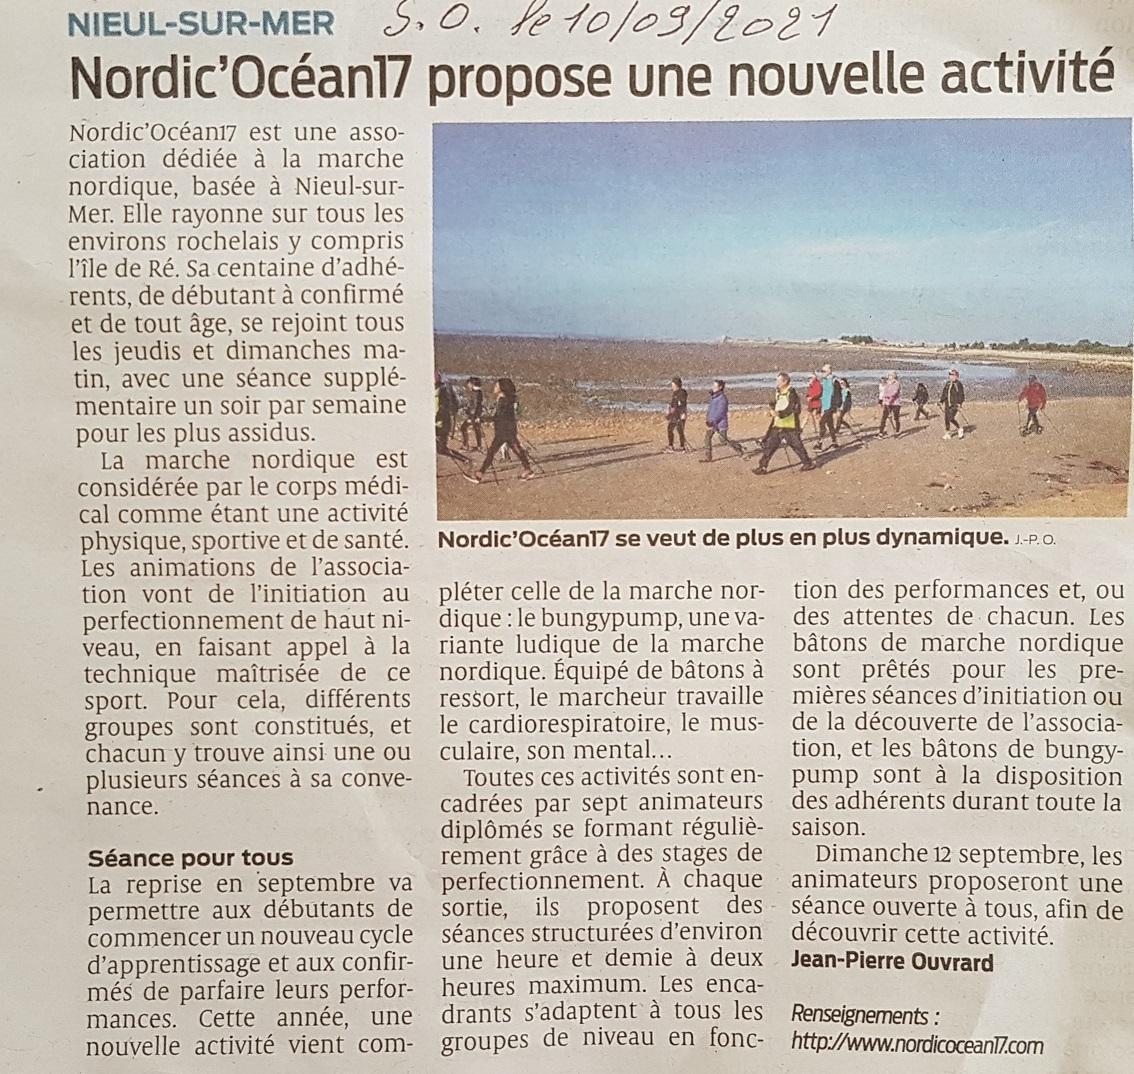 http://www.nordicocean17.com/medias/images/article-so-2023.jpg